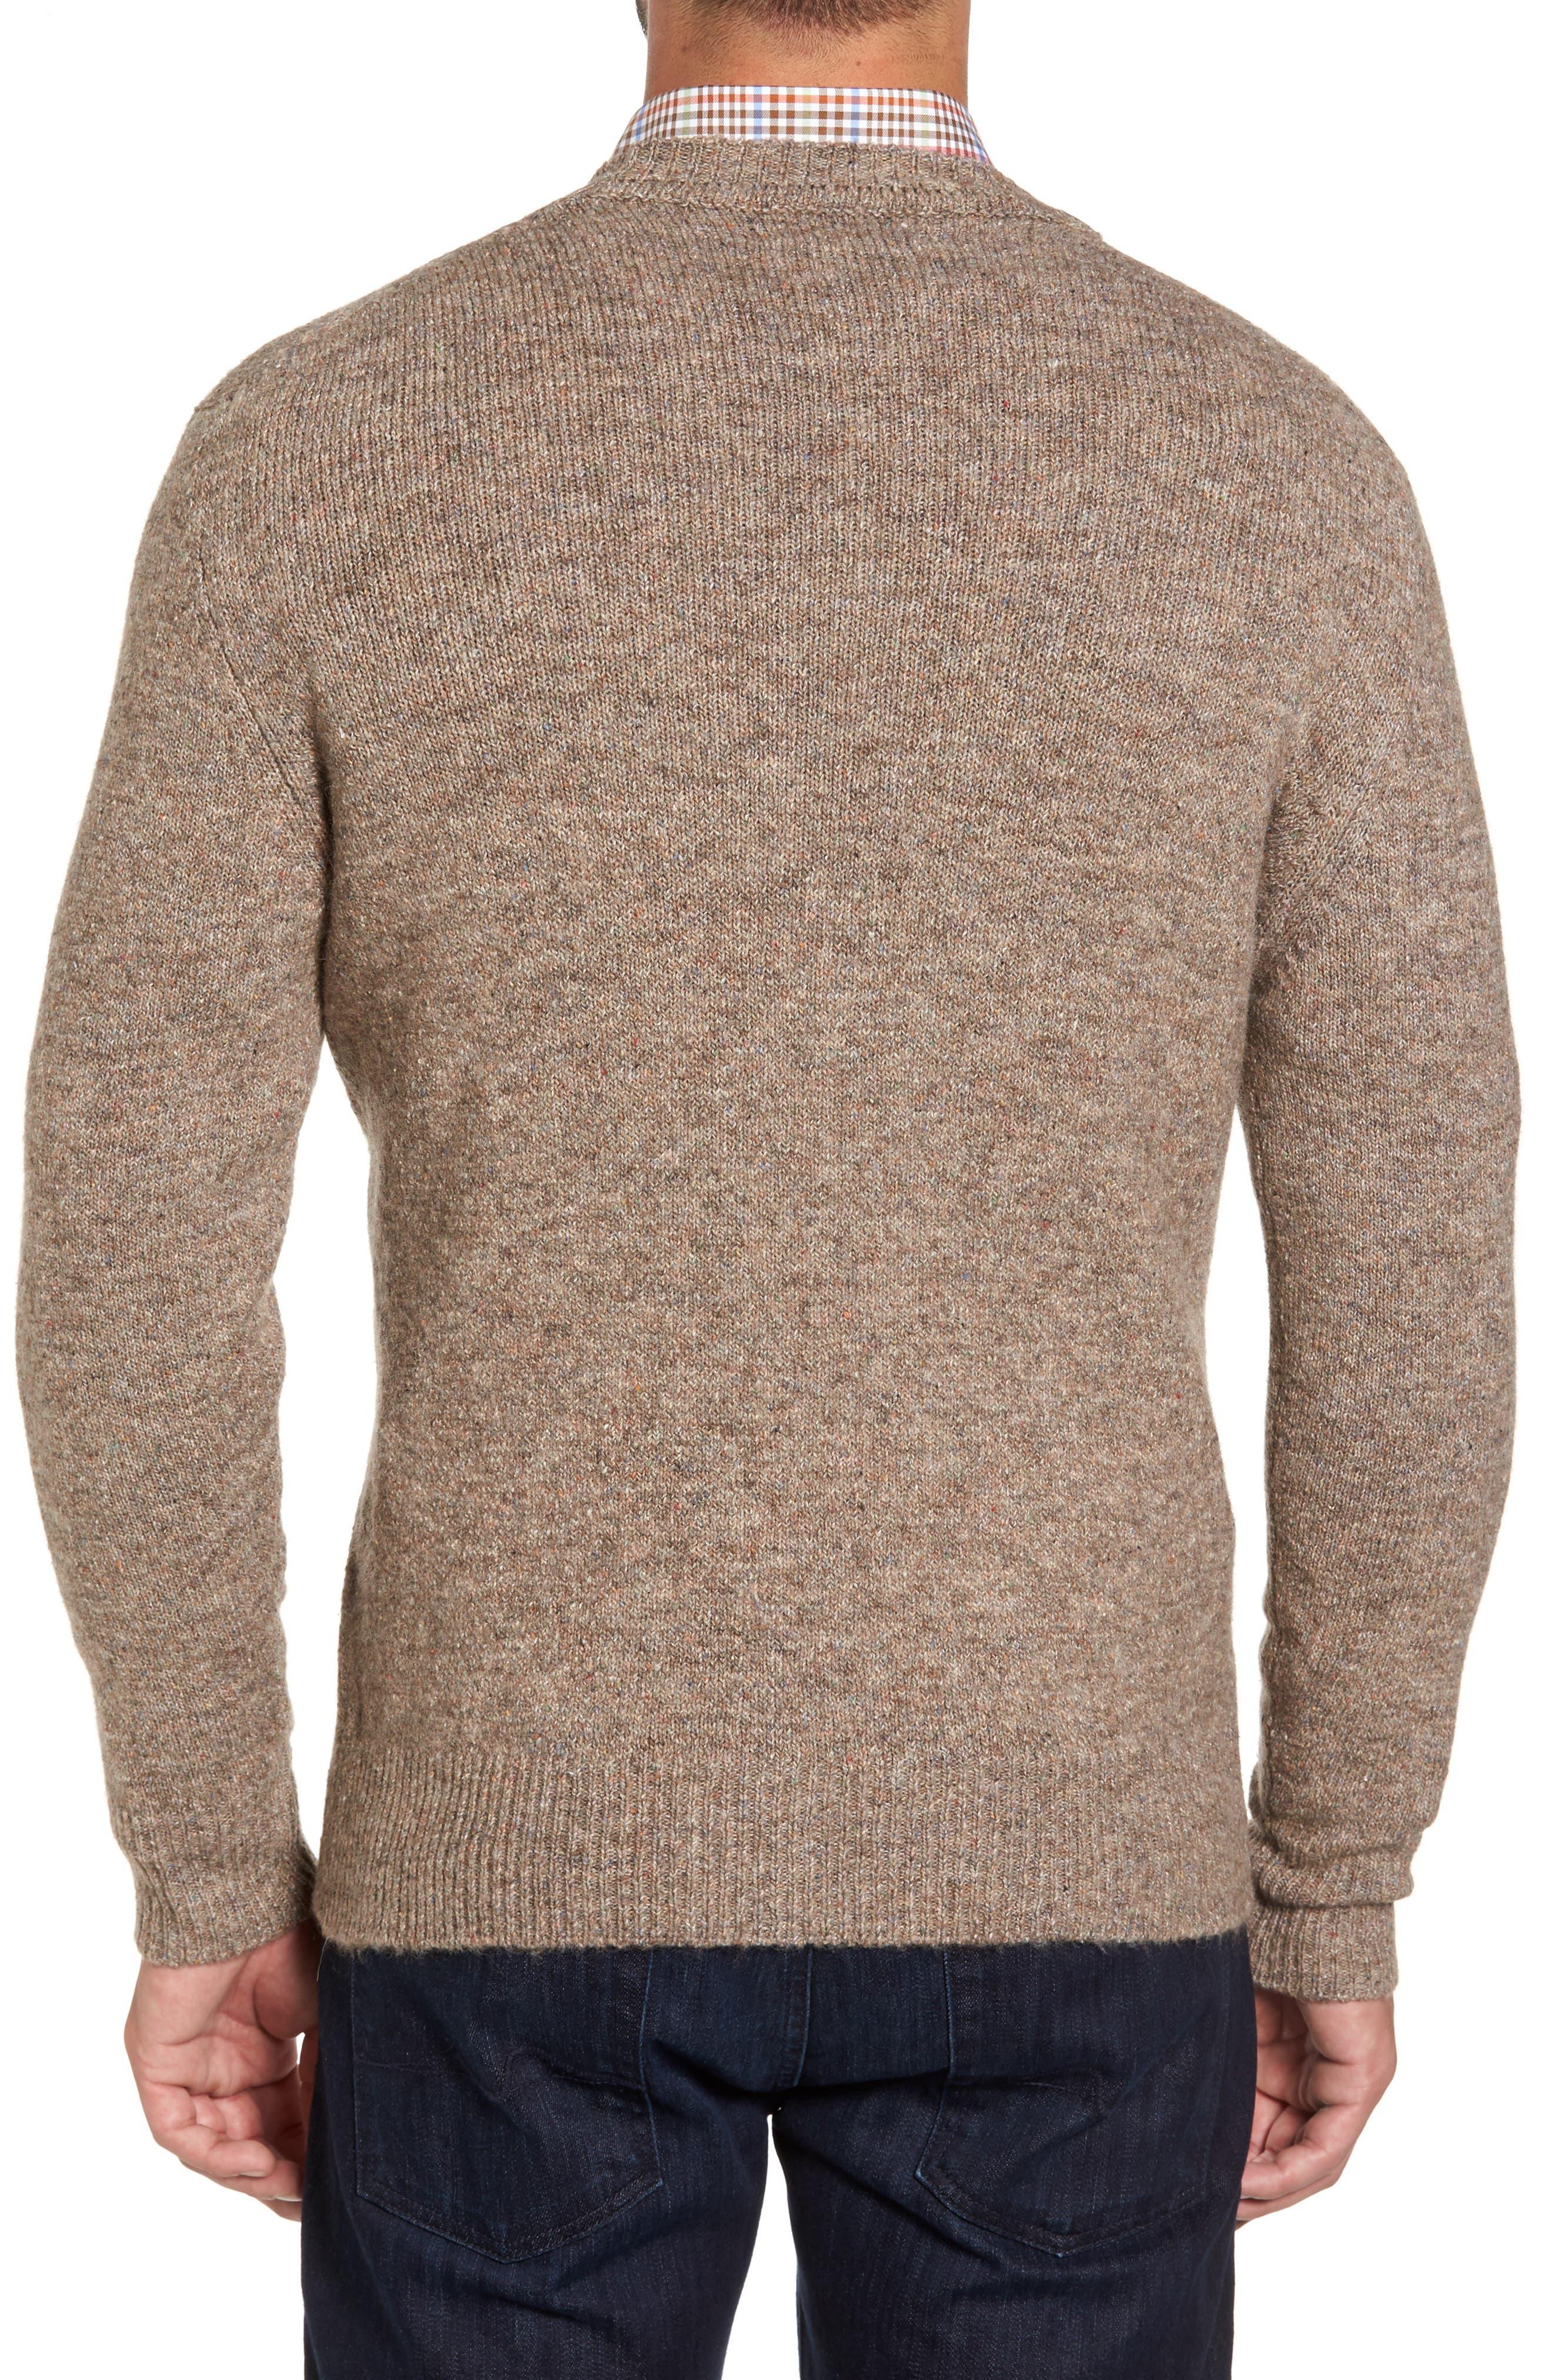 Tweed Crewneck Sweater,                             Alternate thumbnail 2, color,                             Sand